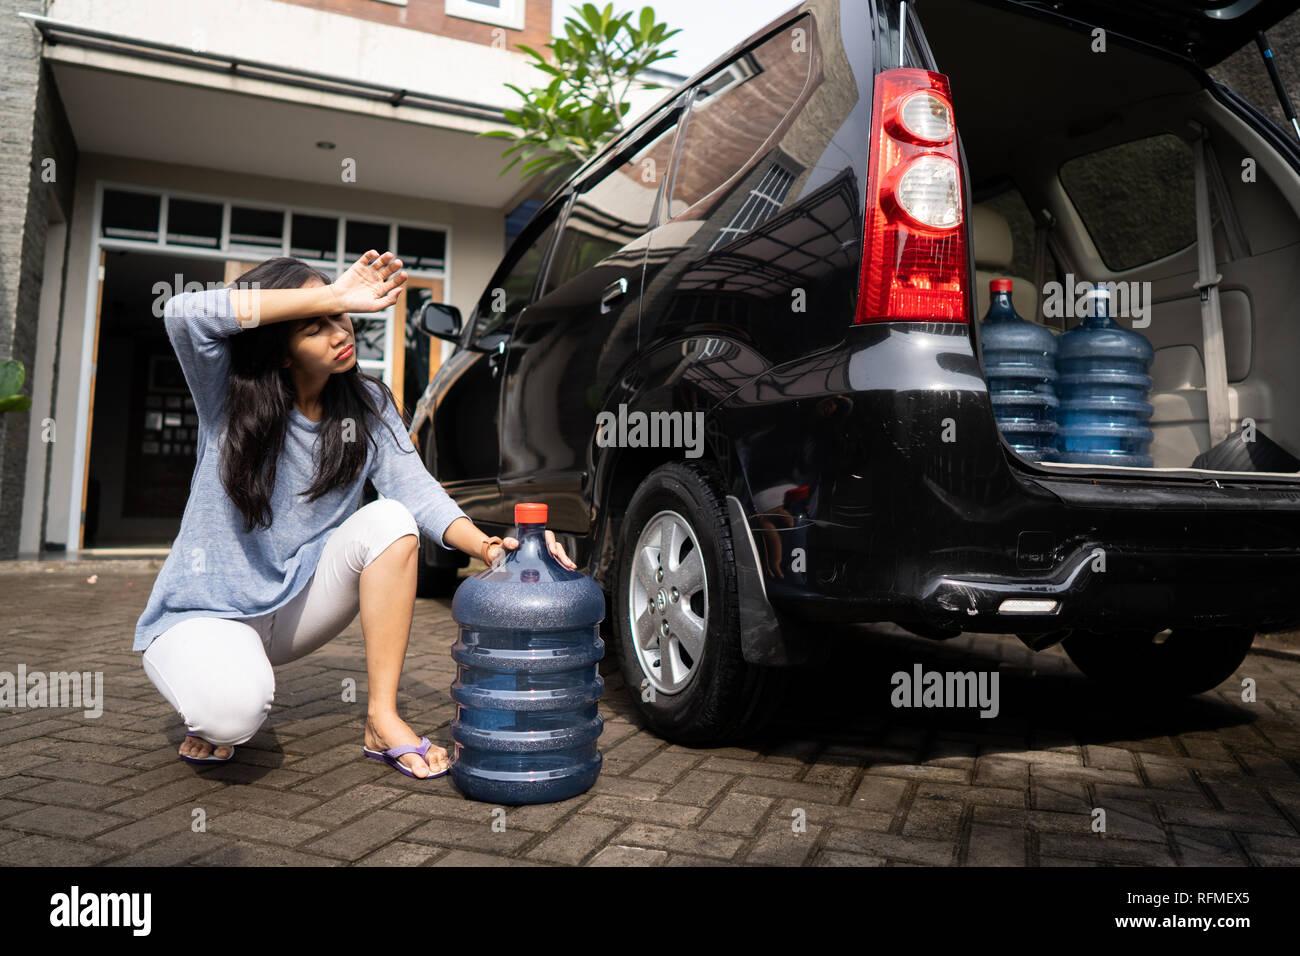 Carry Bottles Fotos e Imágenes de stock Alamy